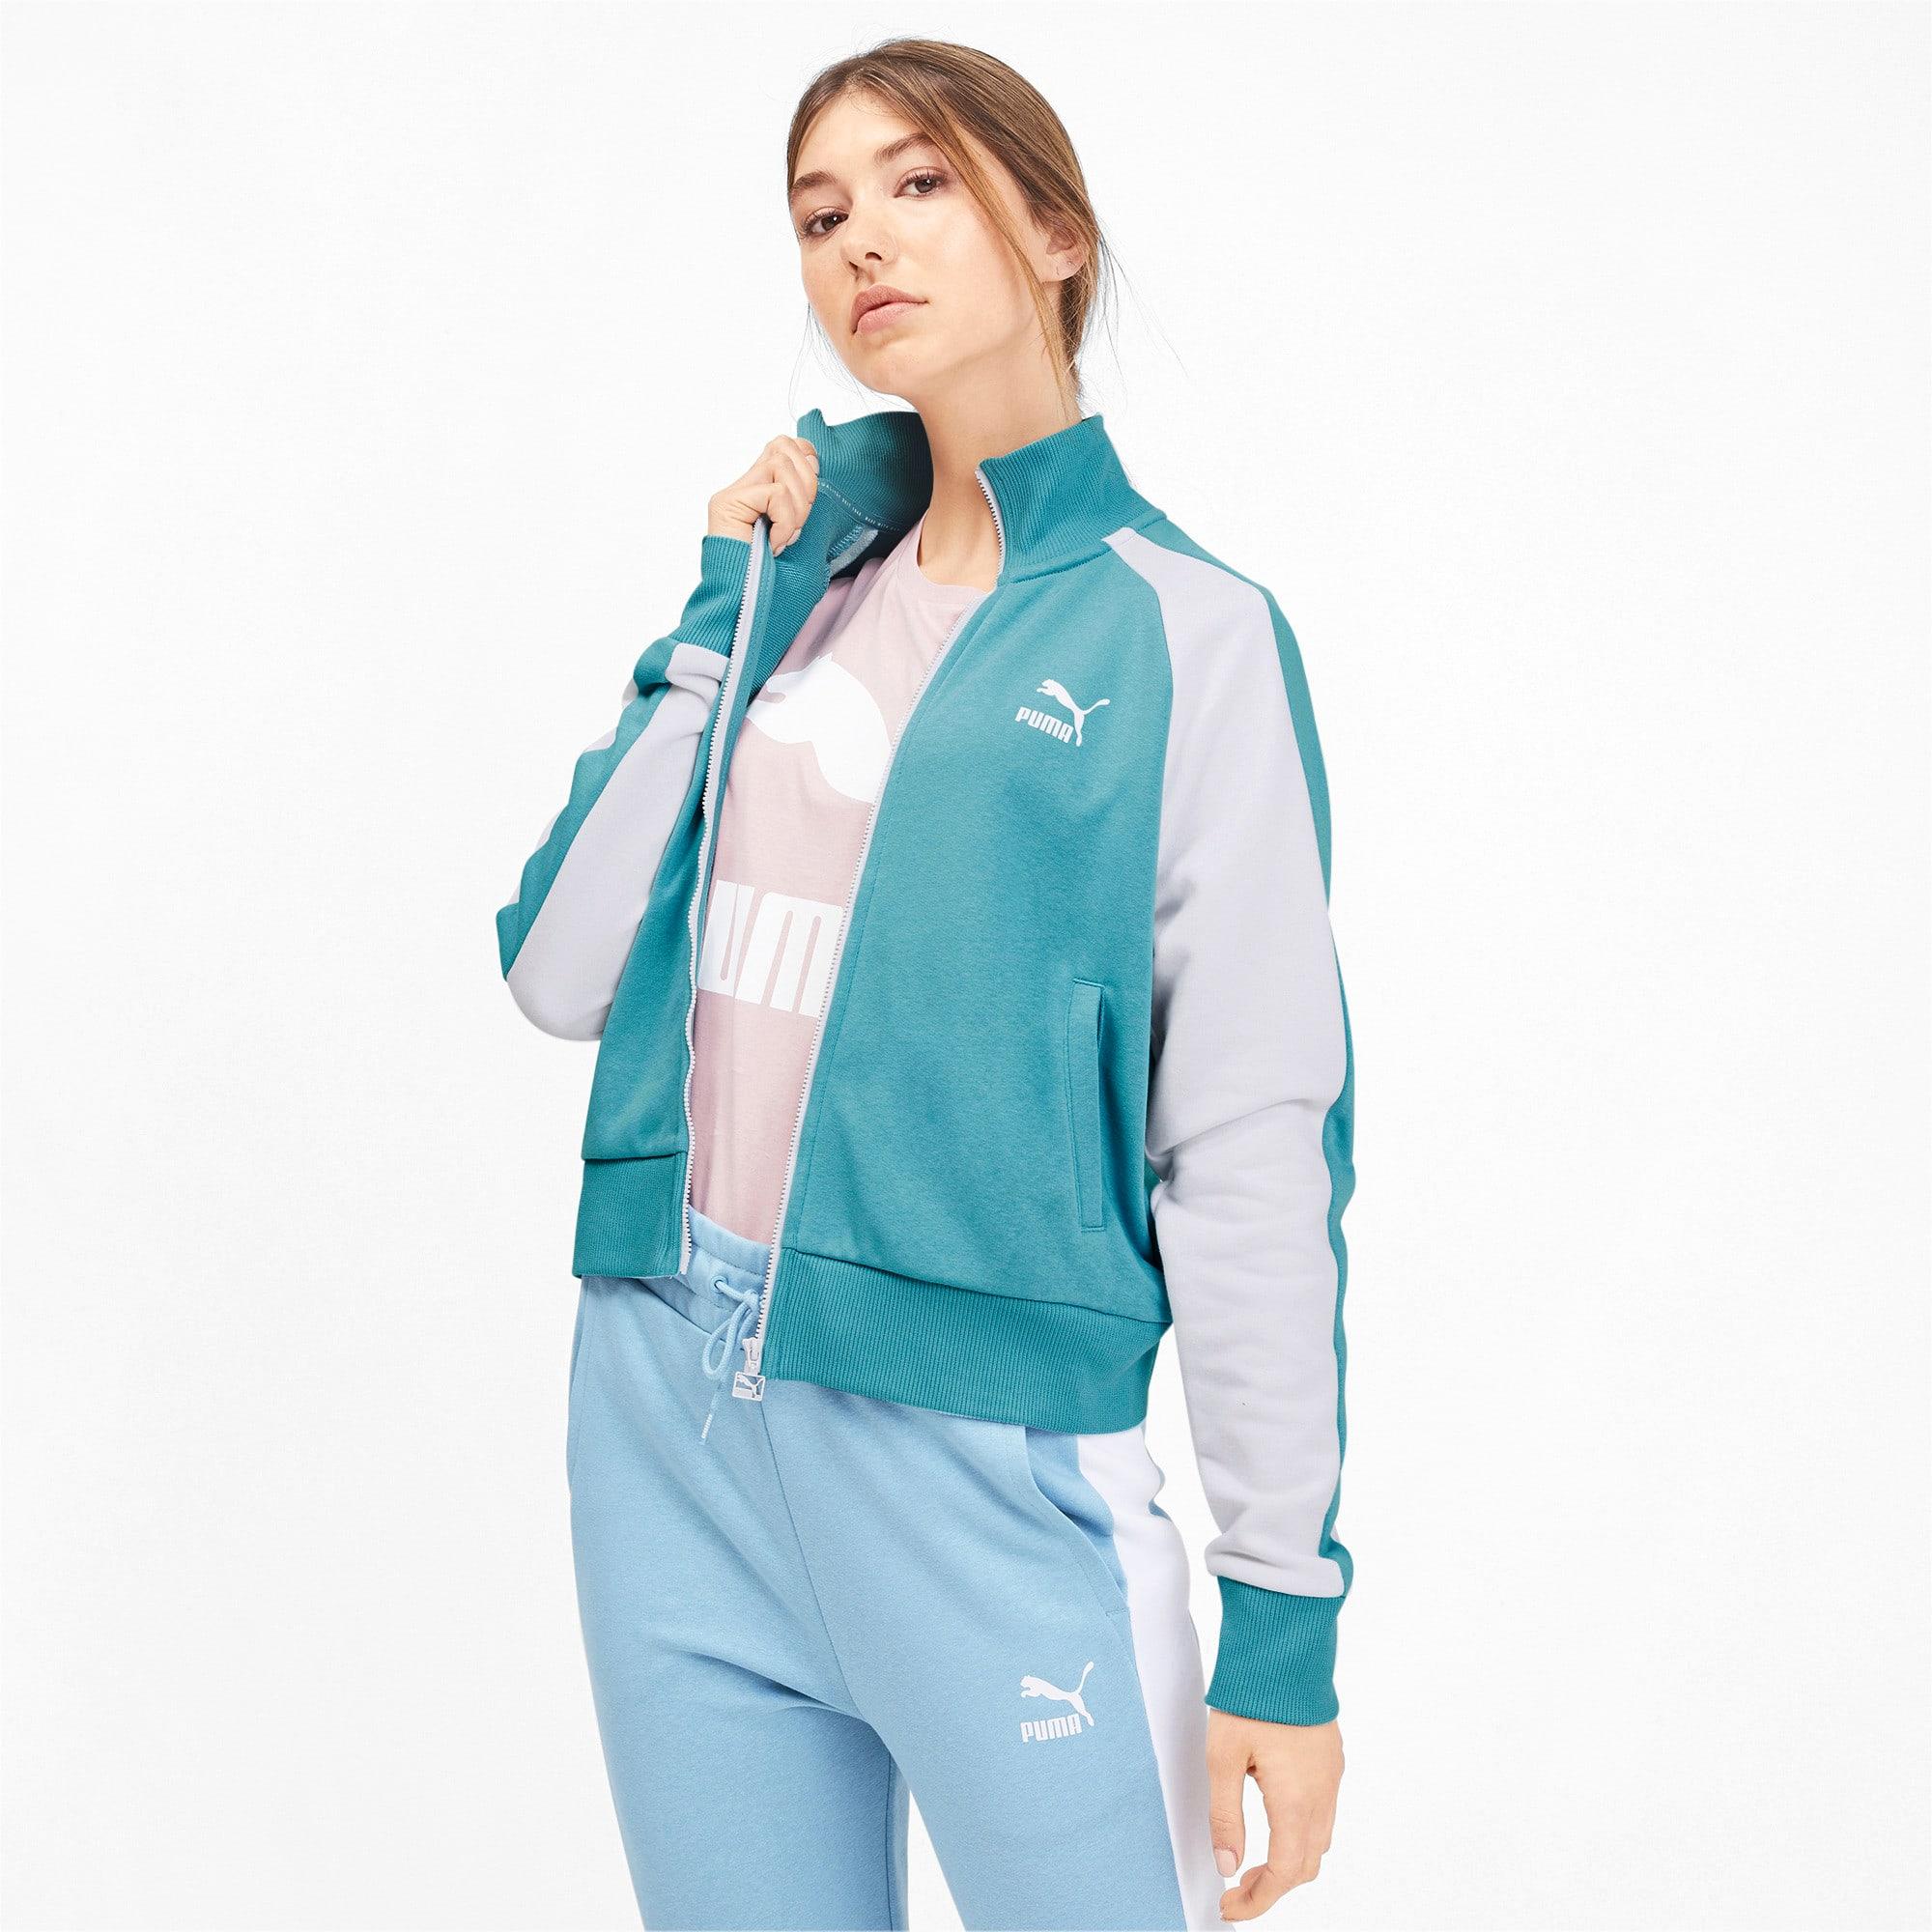 Thumbnail 2 of Classics T7 Women's Track Jacket, Milky Blue, medium